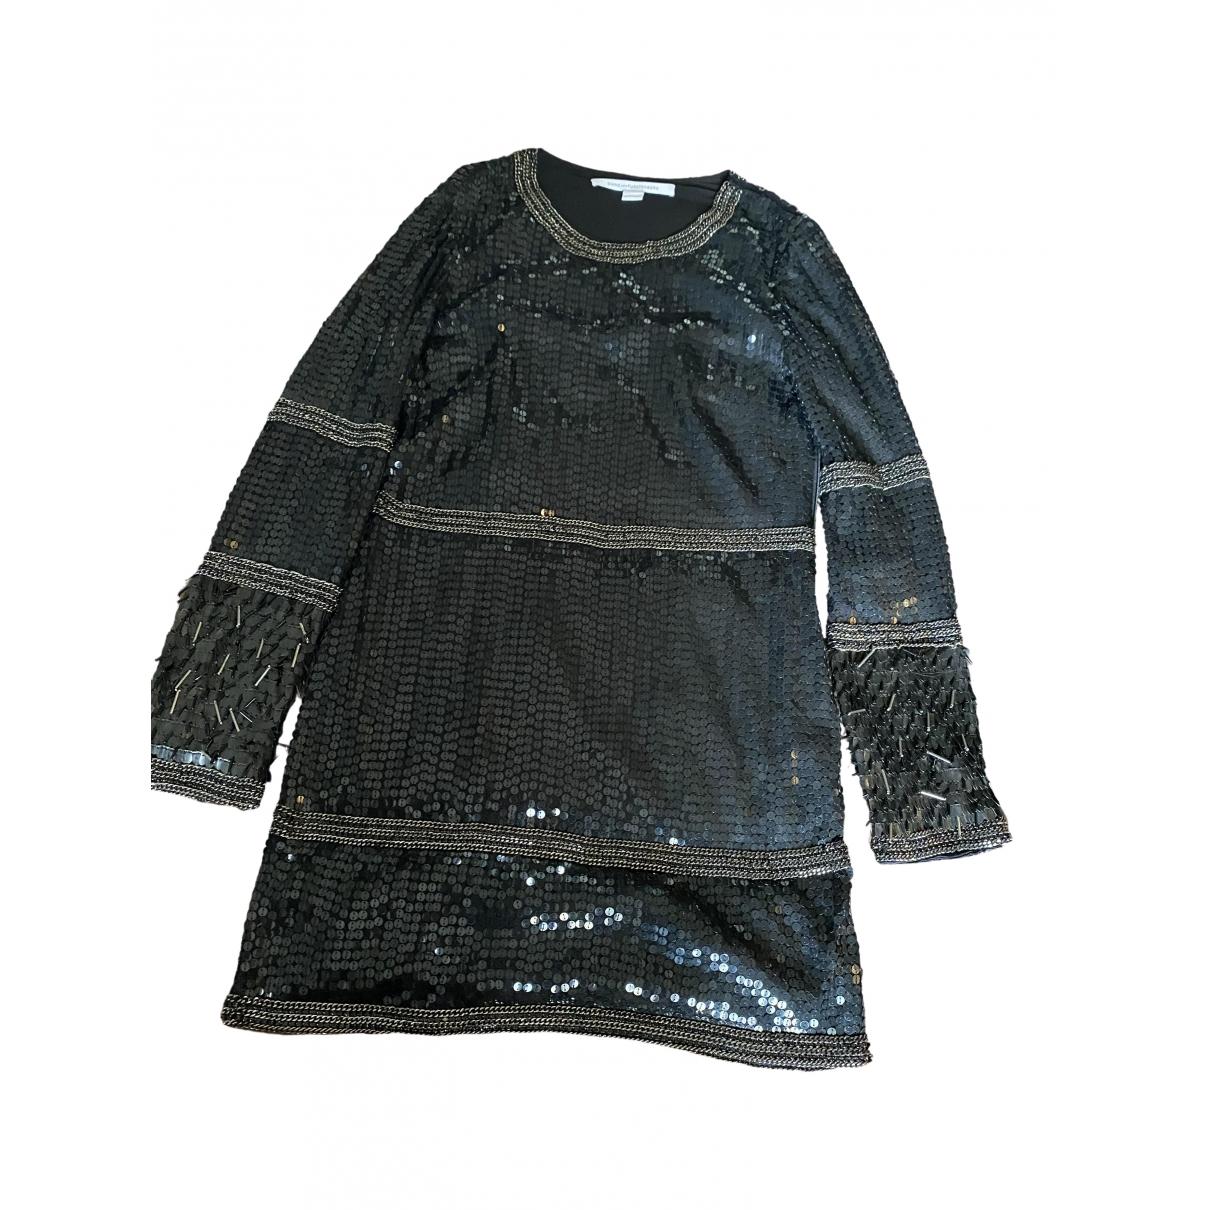 Mini vestido de Con lentejuelas Diane Von Furstenberg